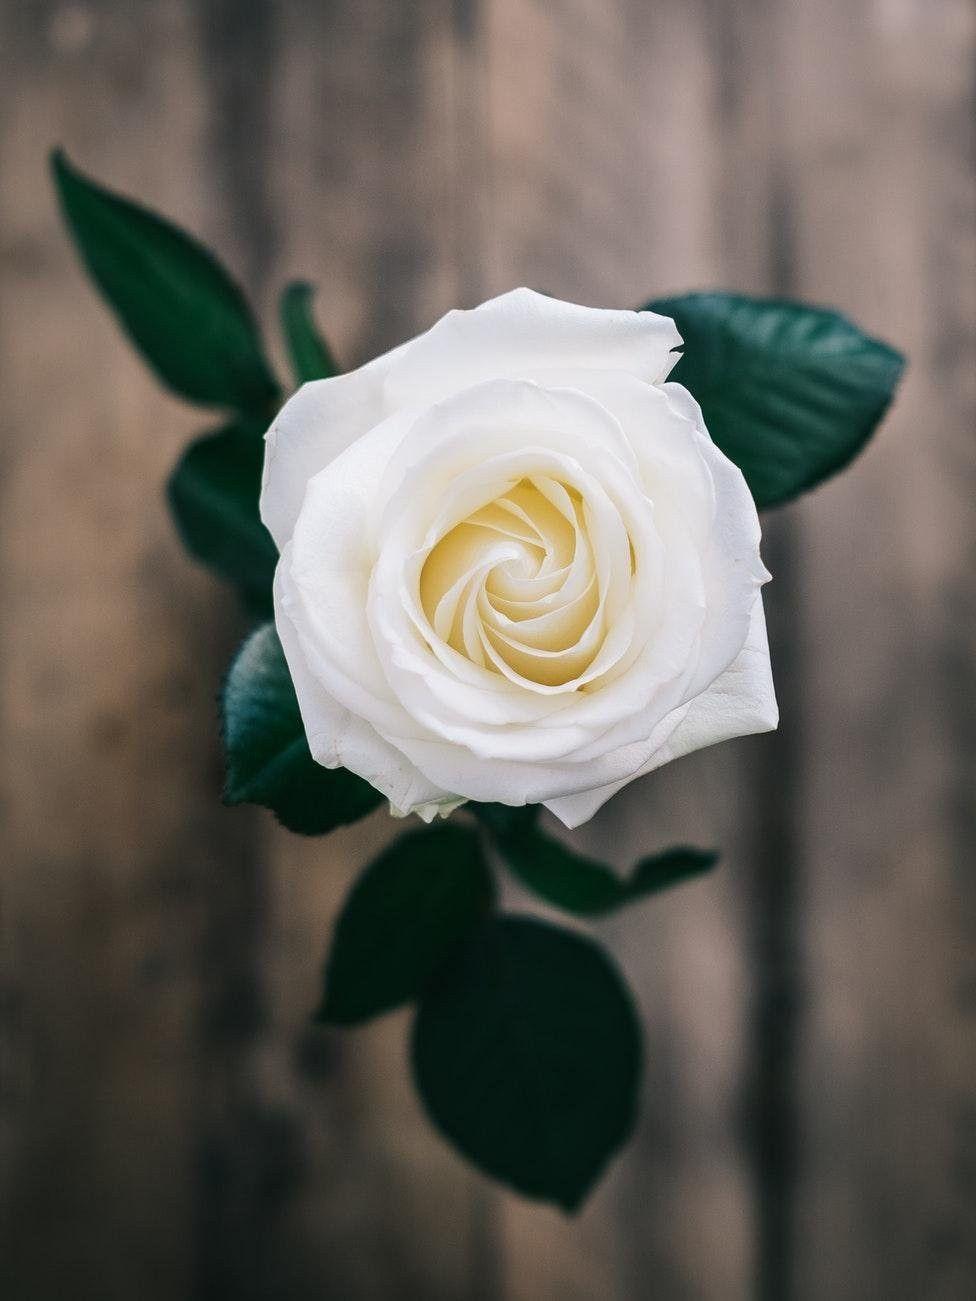 Beautiful white rose wallpapers wallpaper cave beautiful white rose flower wallpaper for phone and hd desktop mightylinksfo